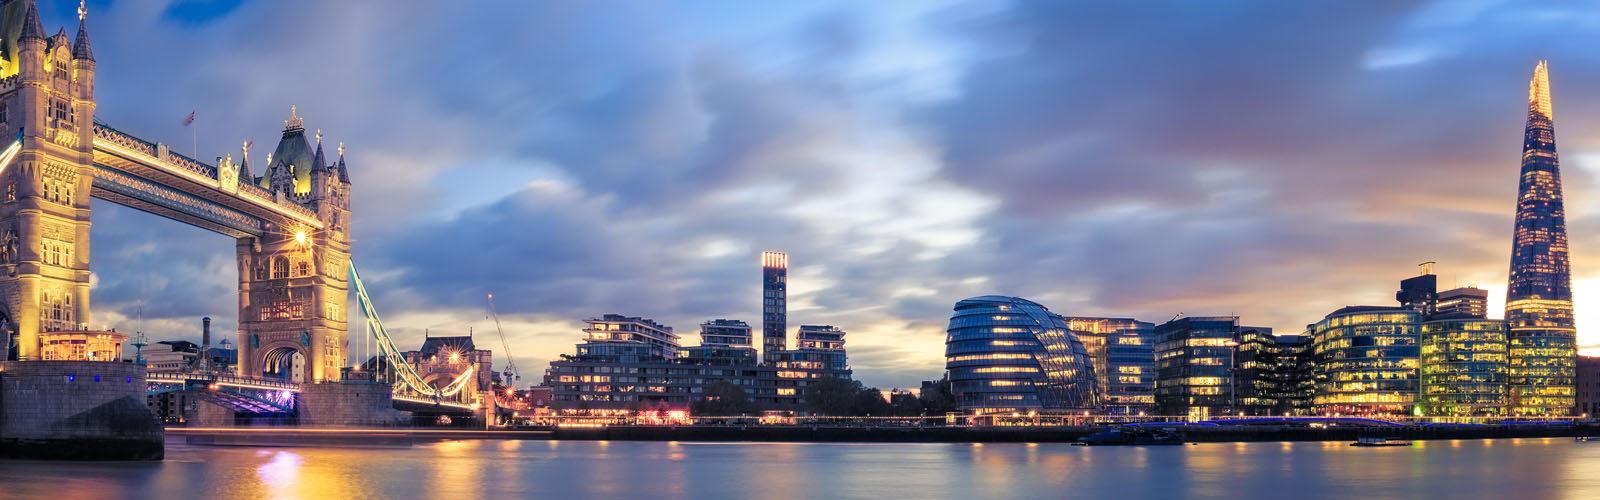 Tower Bridge at Sunset in London.